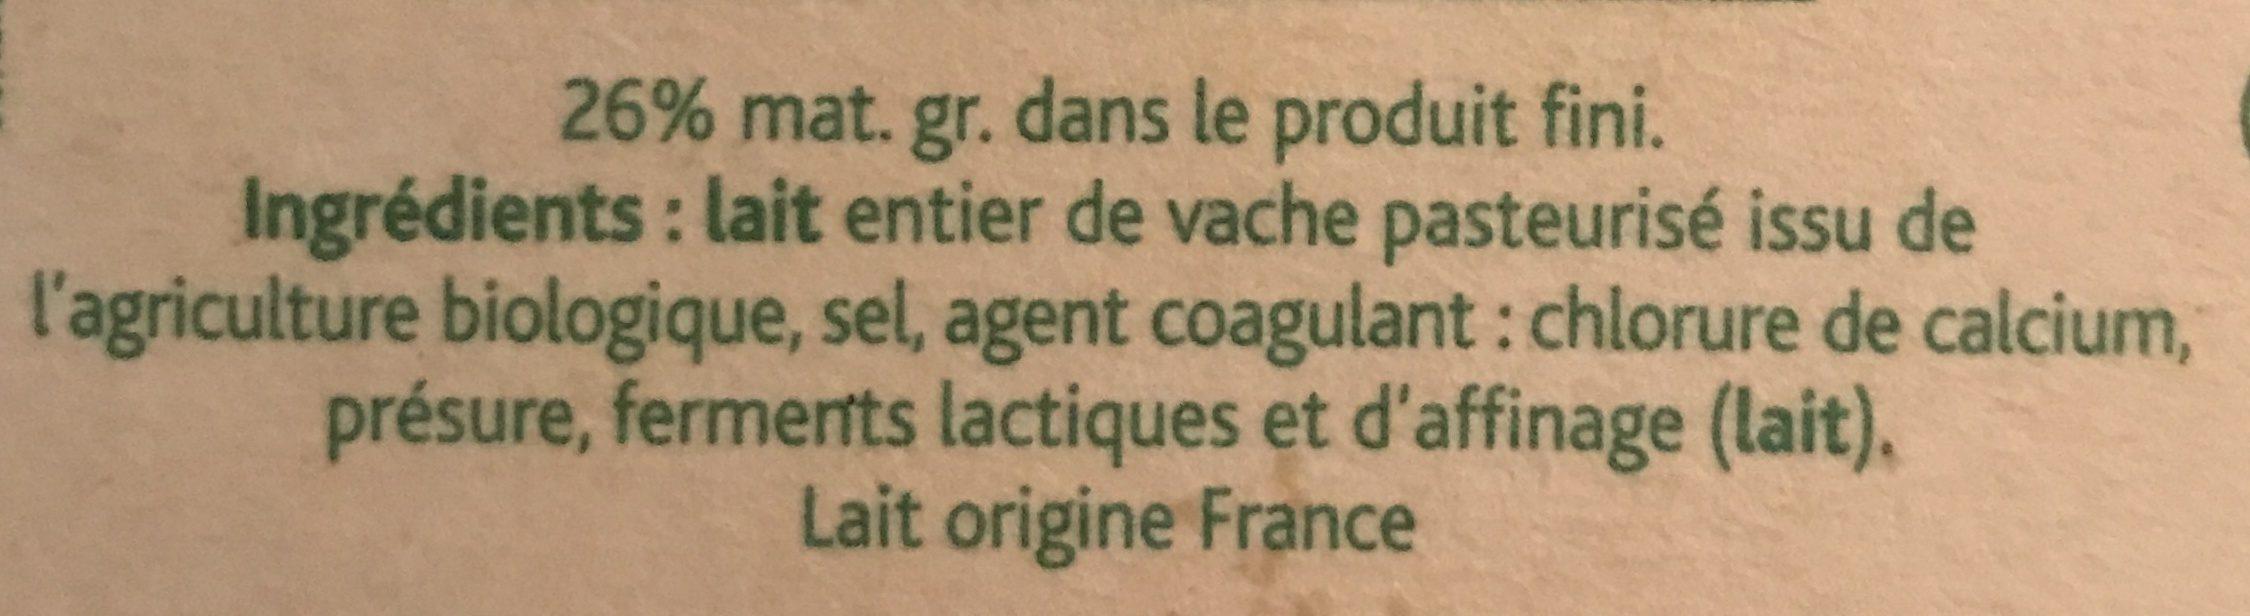 Camembert Bons Mayennais (26% MG) - Ingrédients - fr